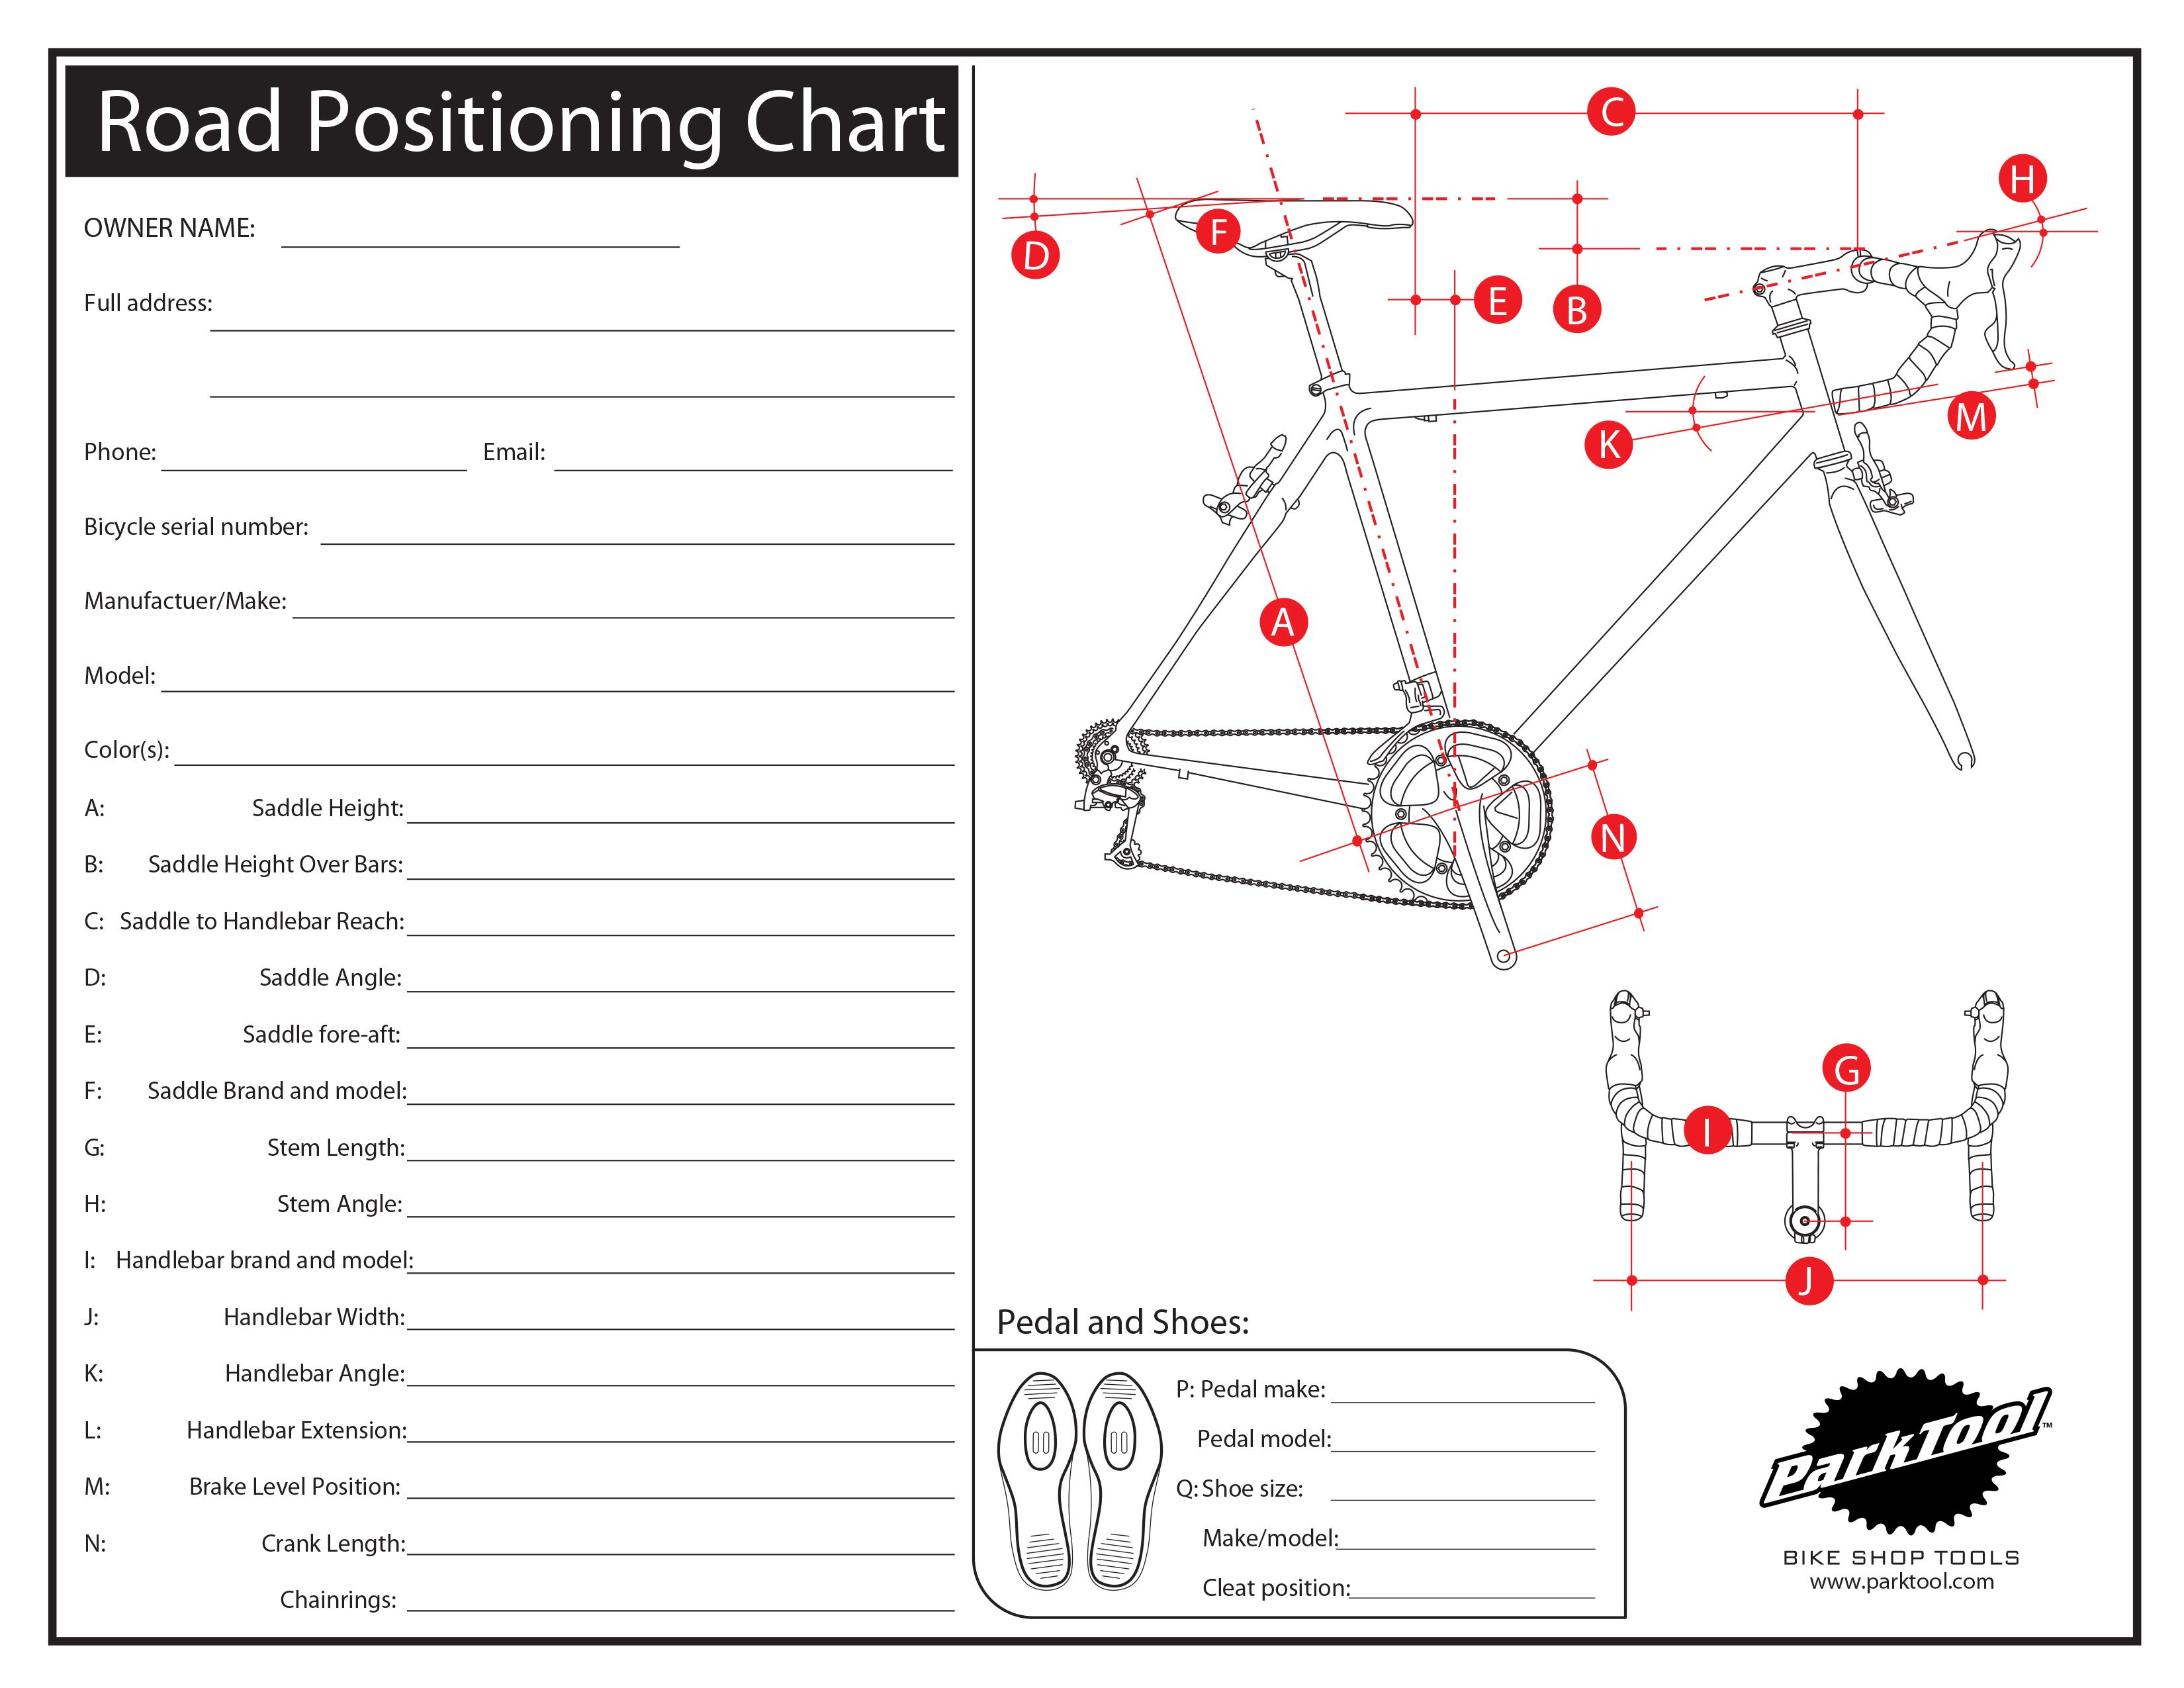 Road Positioning Chart Sykkelvedlikehold, Sykkel, Parkverktøy  Bicycle maintenance, Bicycle, Park tool